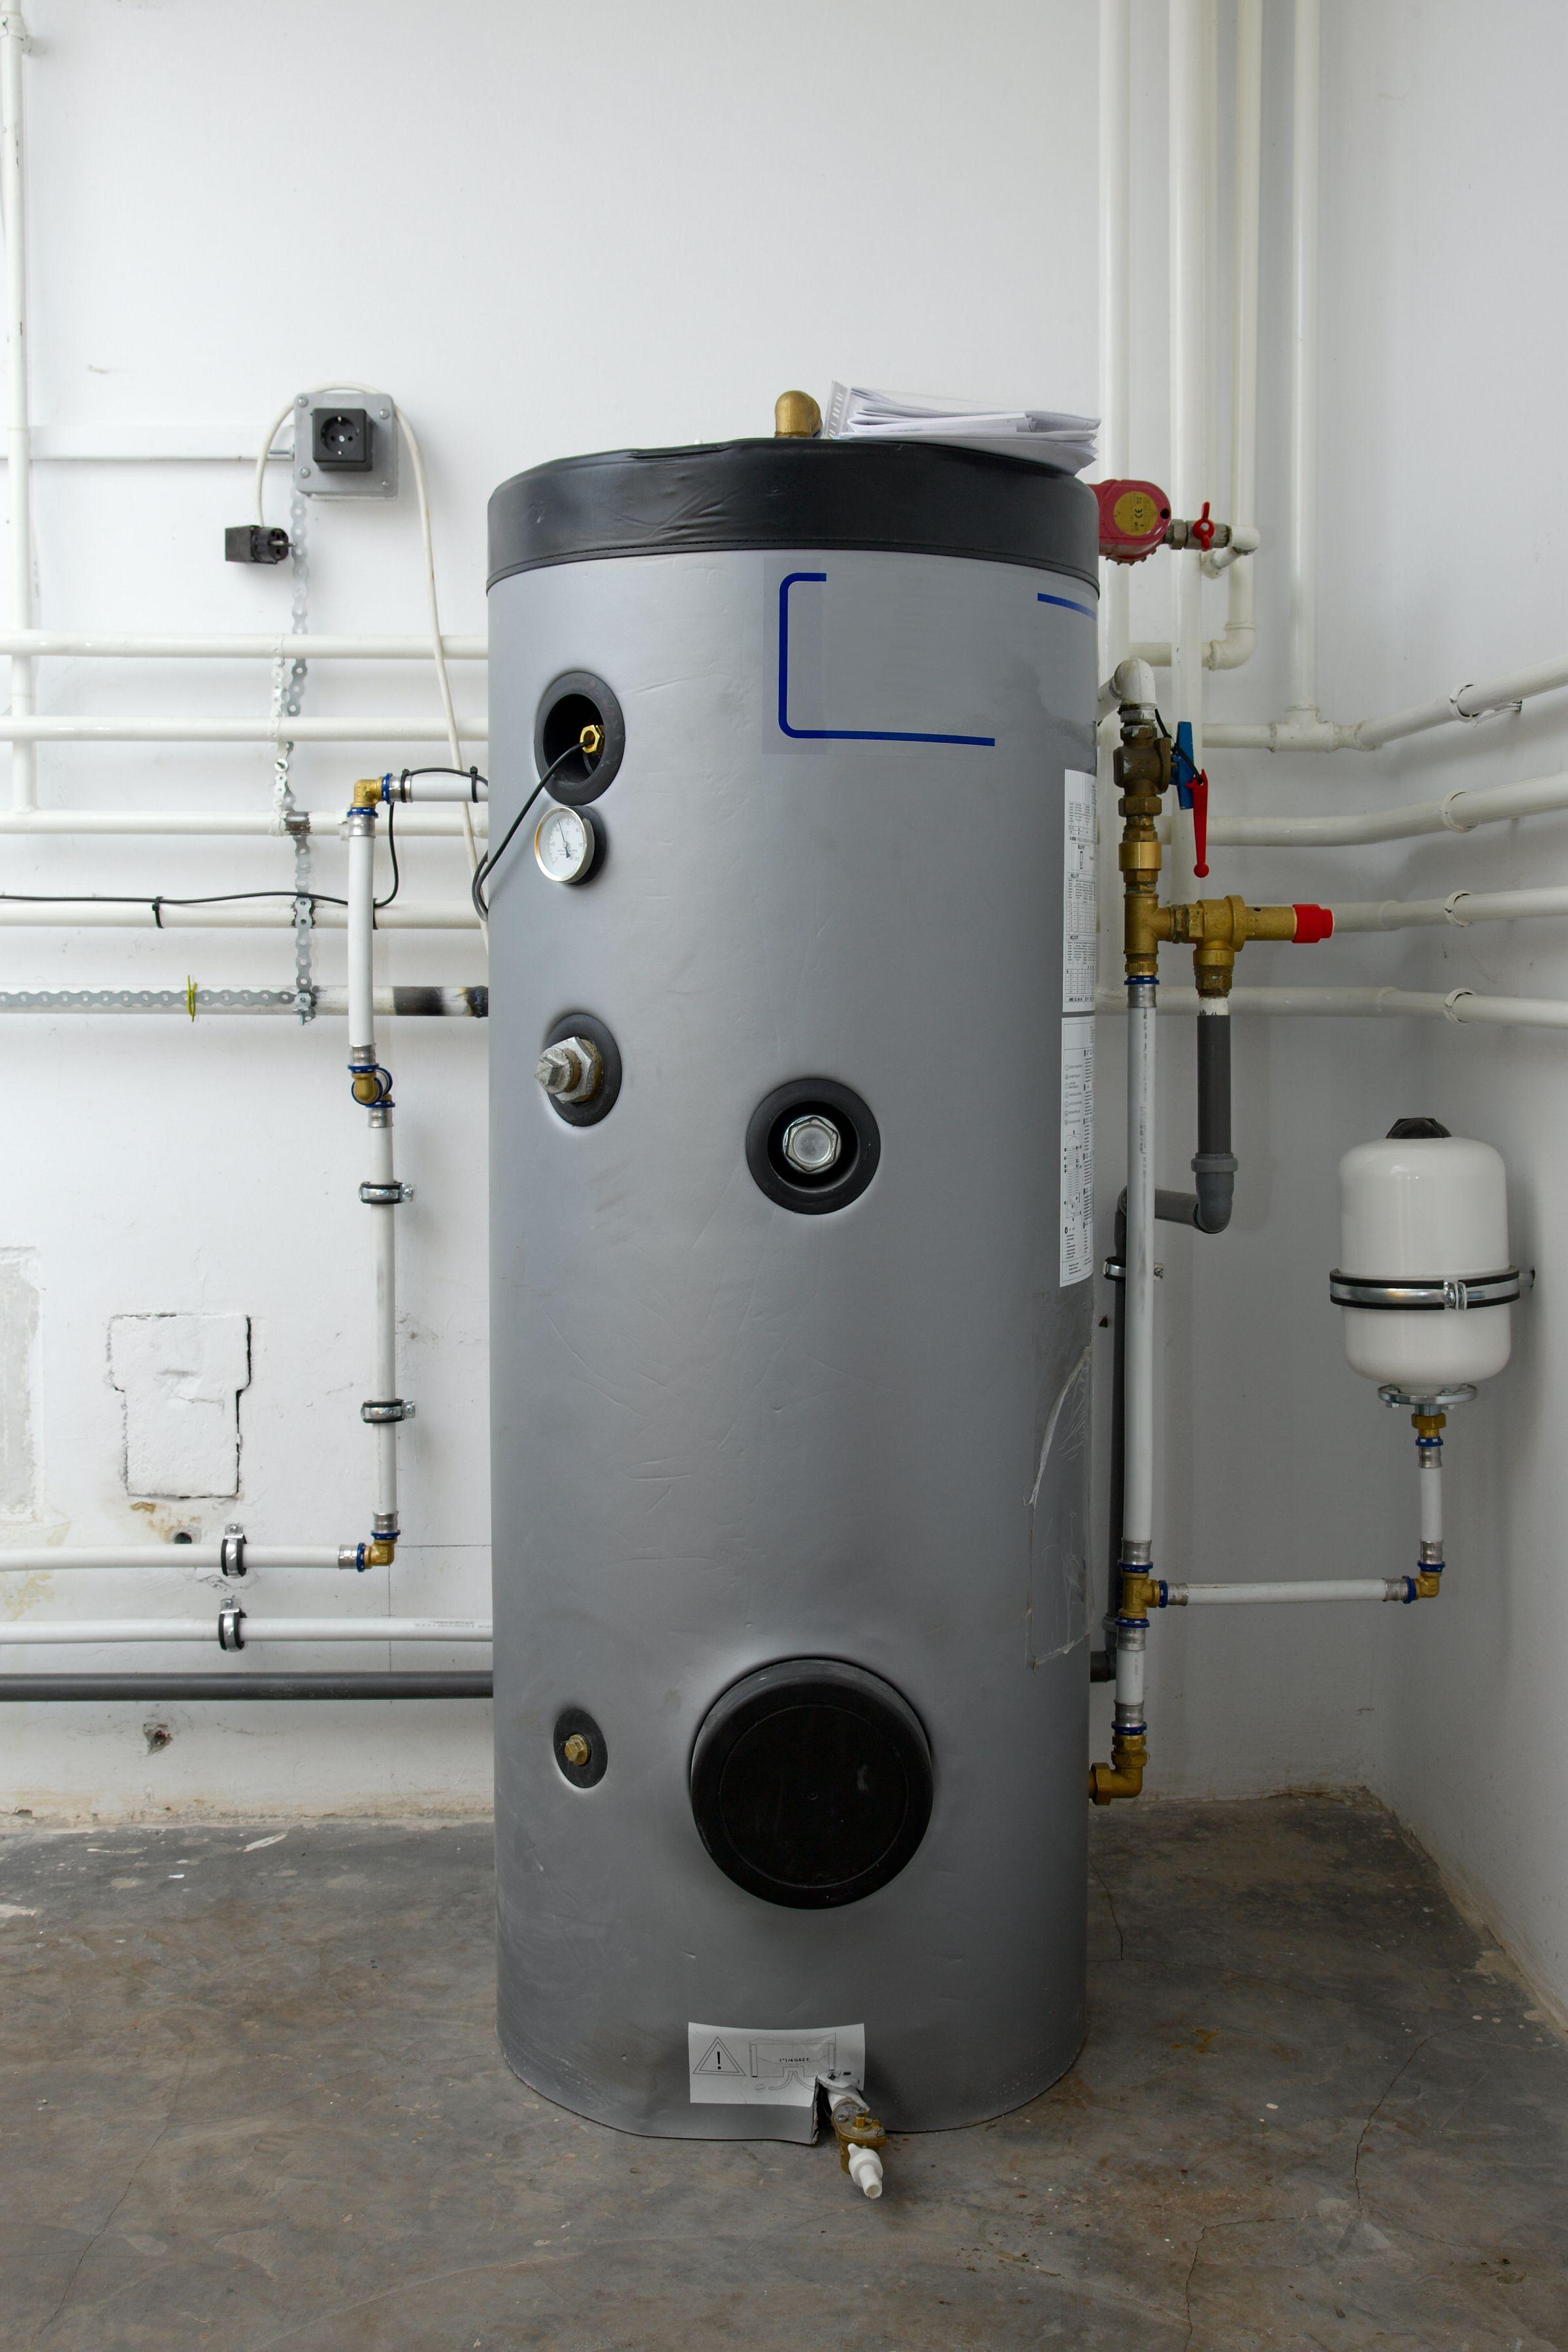 Gu a para reparar un calentador de agua el ctrico o a gas for Calentador de agua a gas